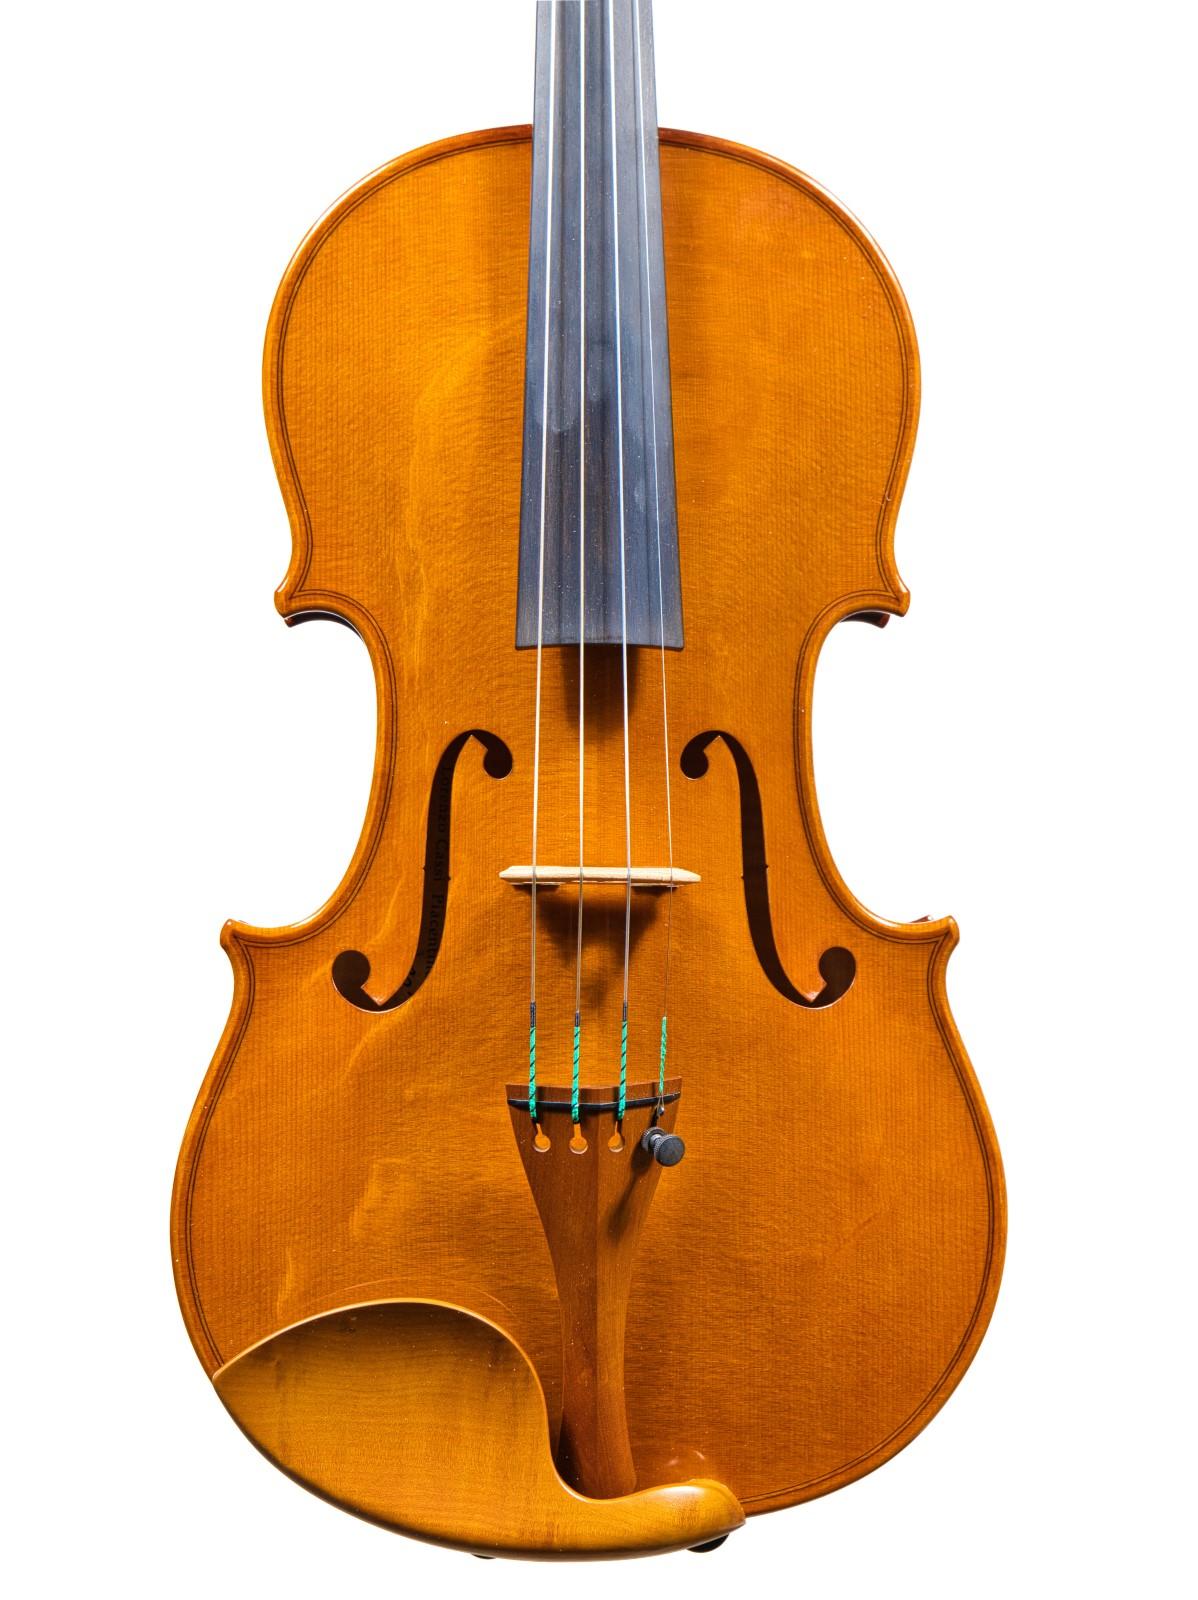 Violin by Lorenzo Cassi, 2021